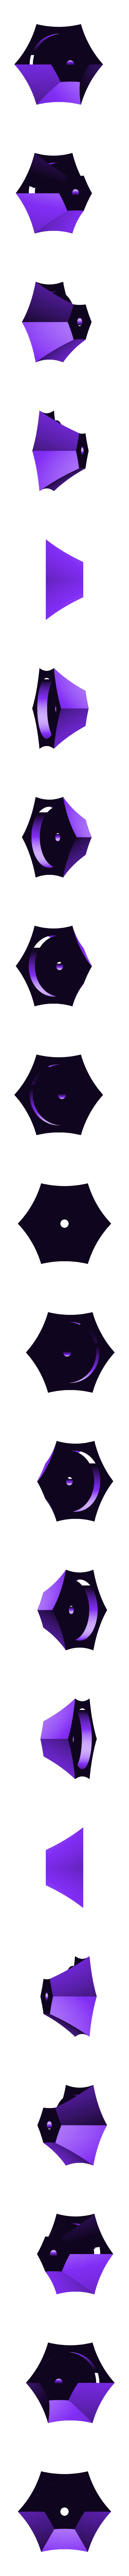 dispencer_top.stl Download free STL file Little Bird Feeder Air Temple • 3D printer model, Job